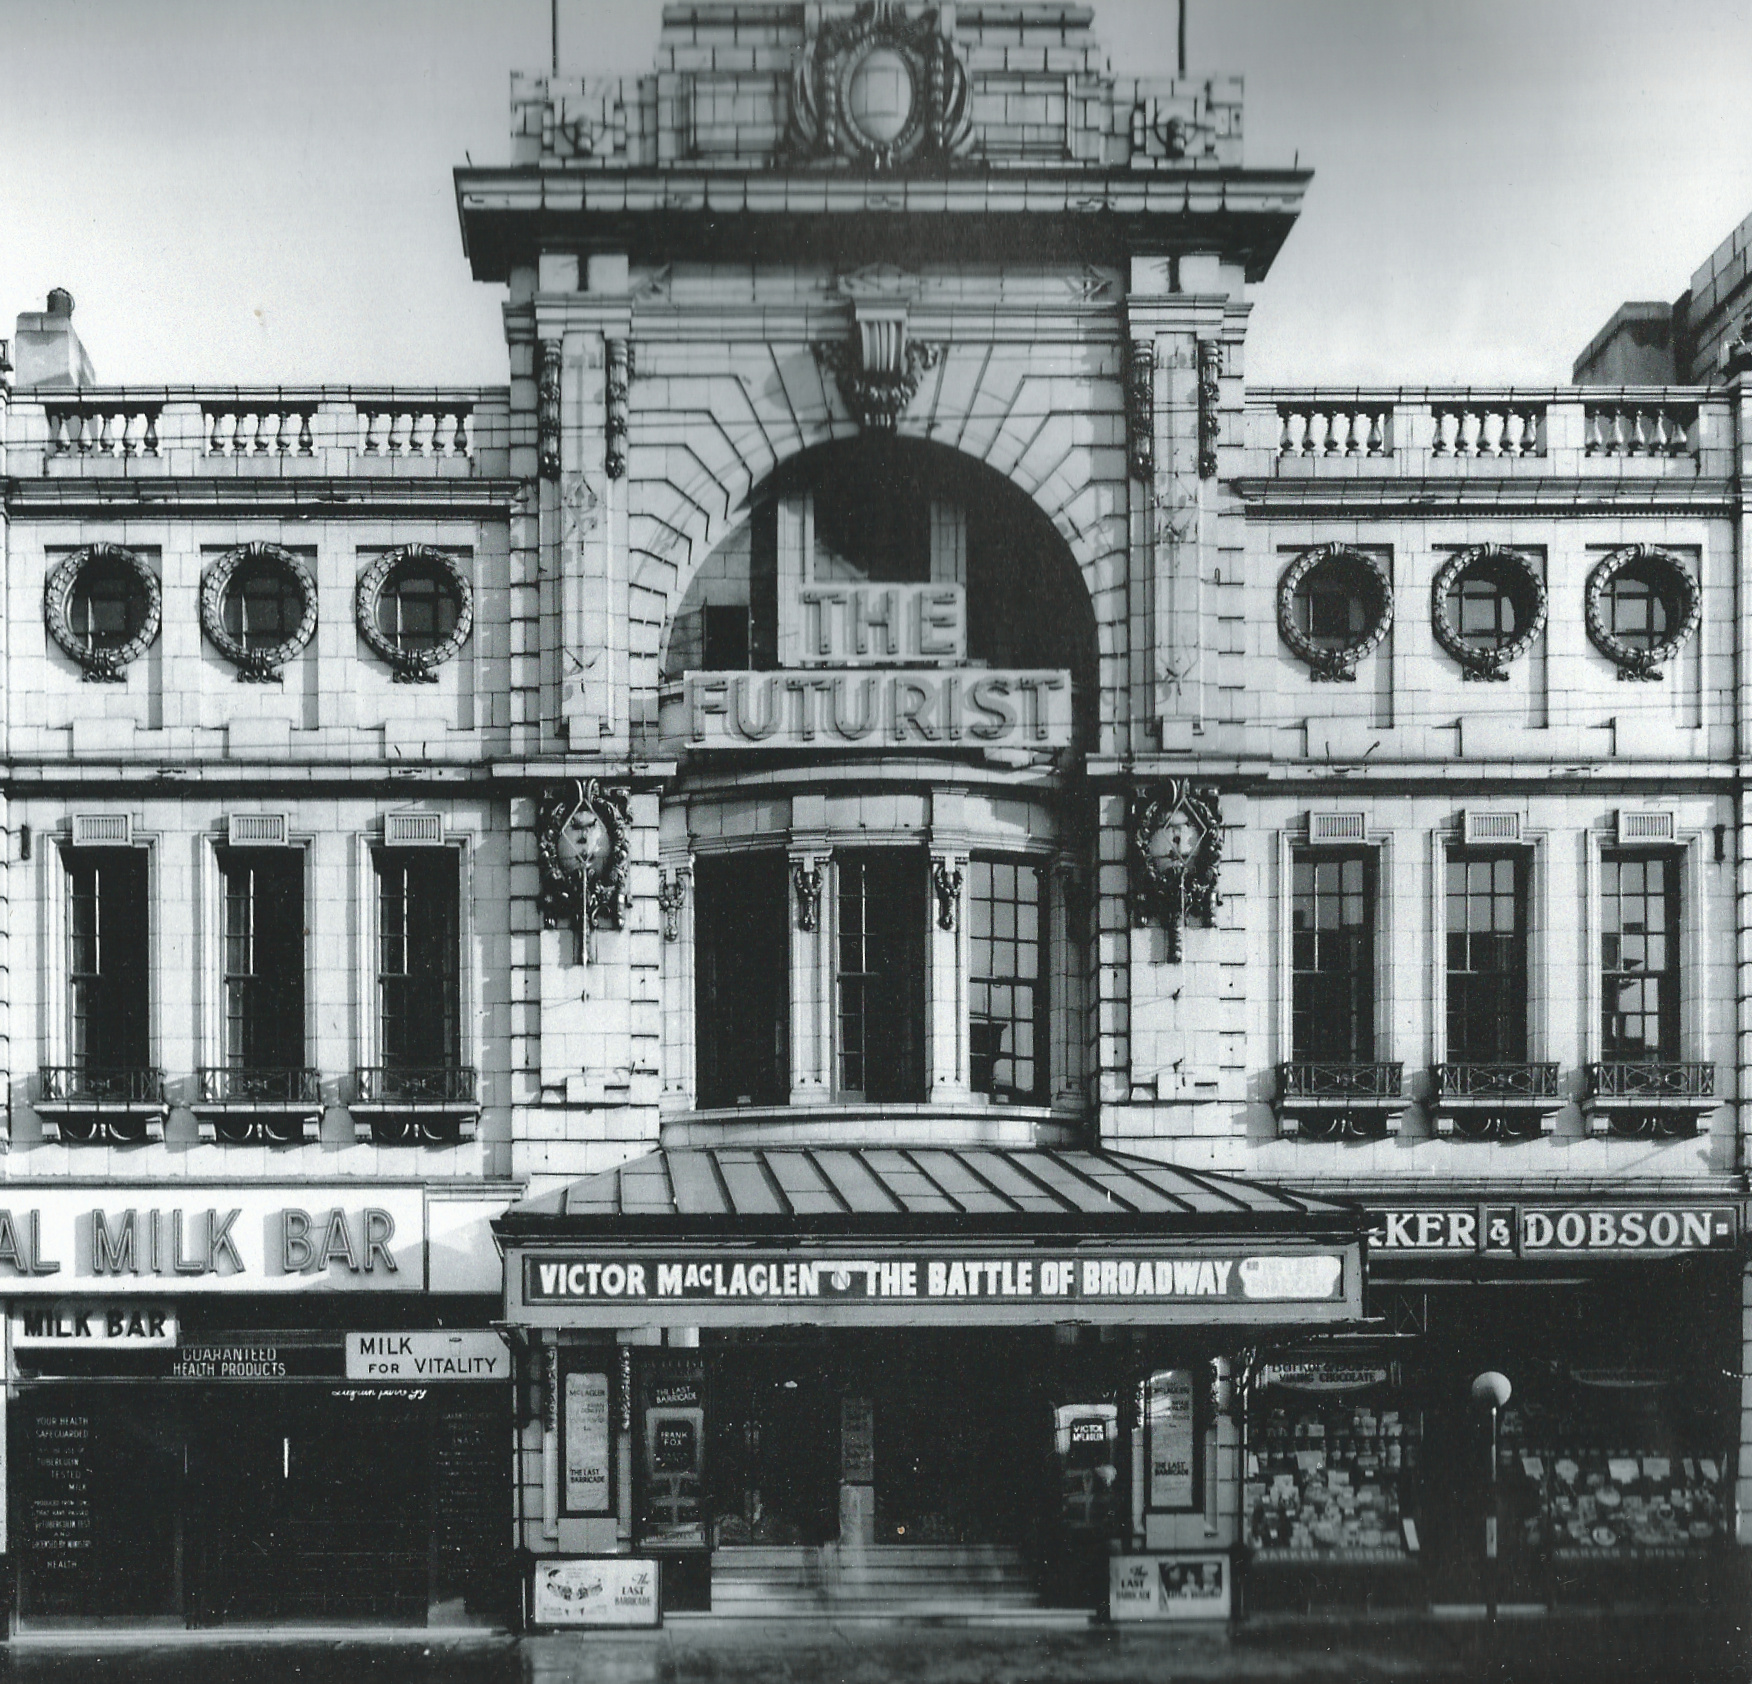 The Futurist Cinema Liverpool Wikipedia